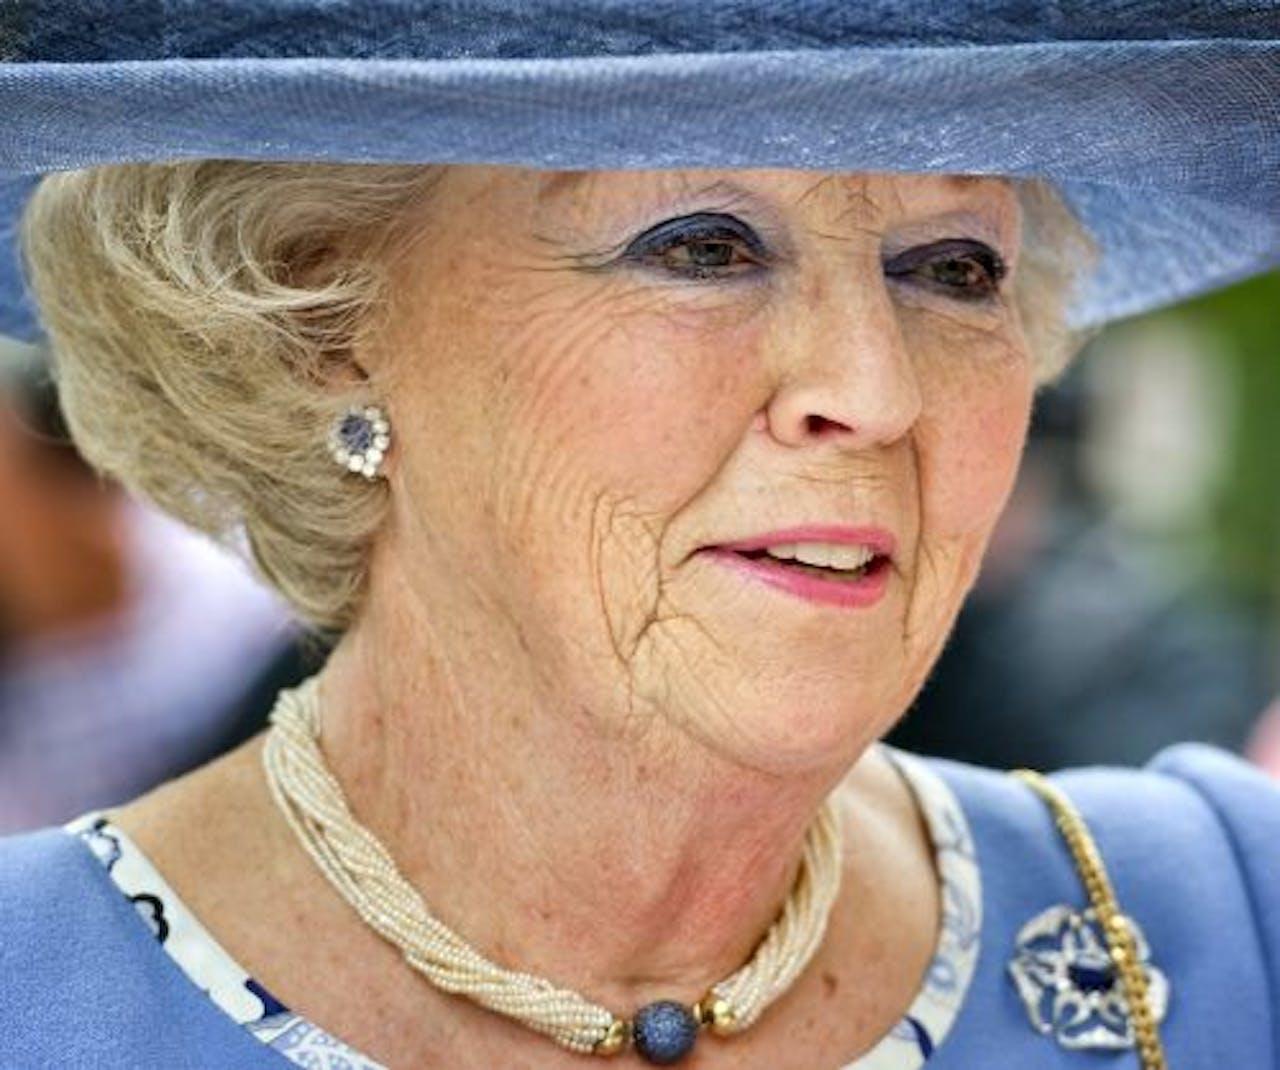 Koningin Beatrix. ANP